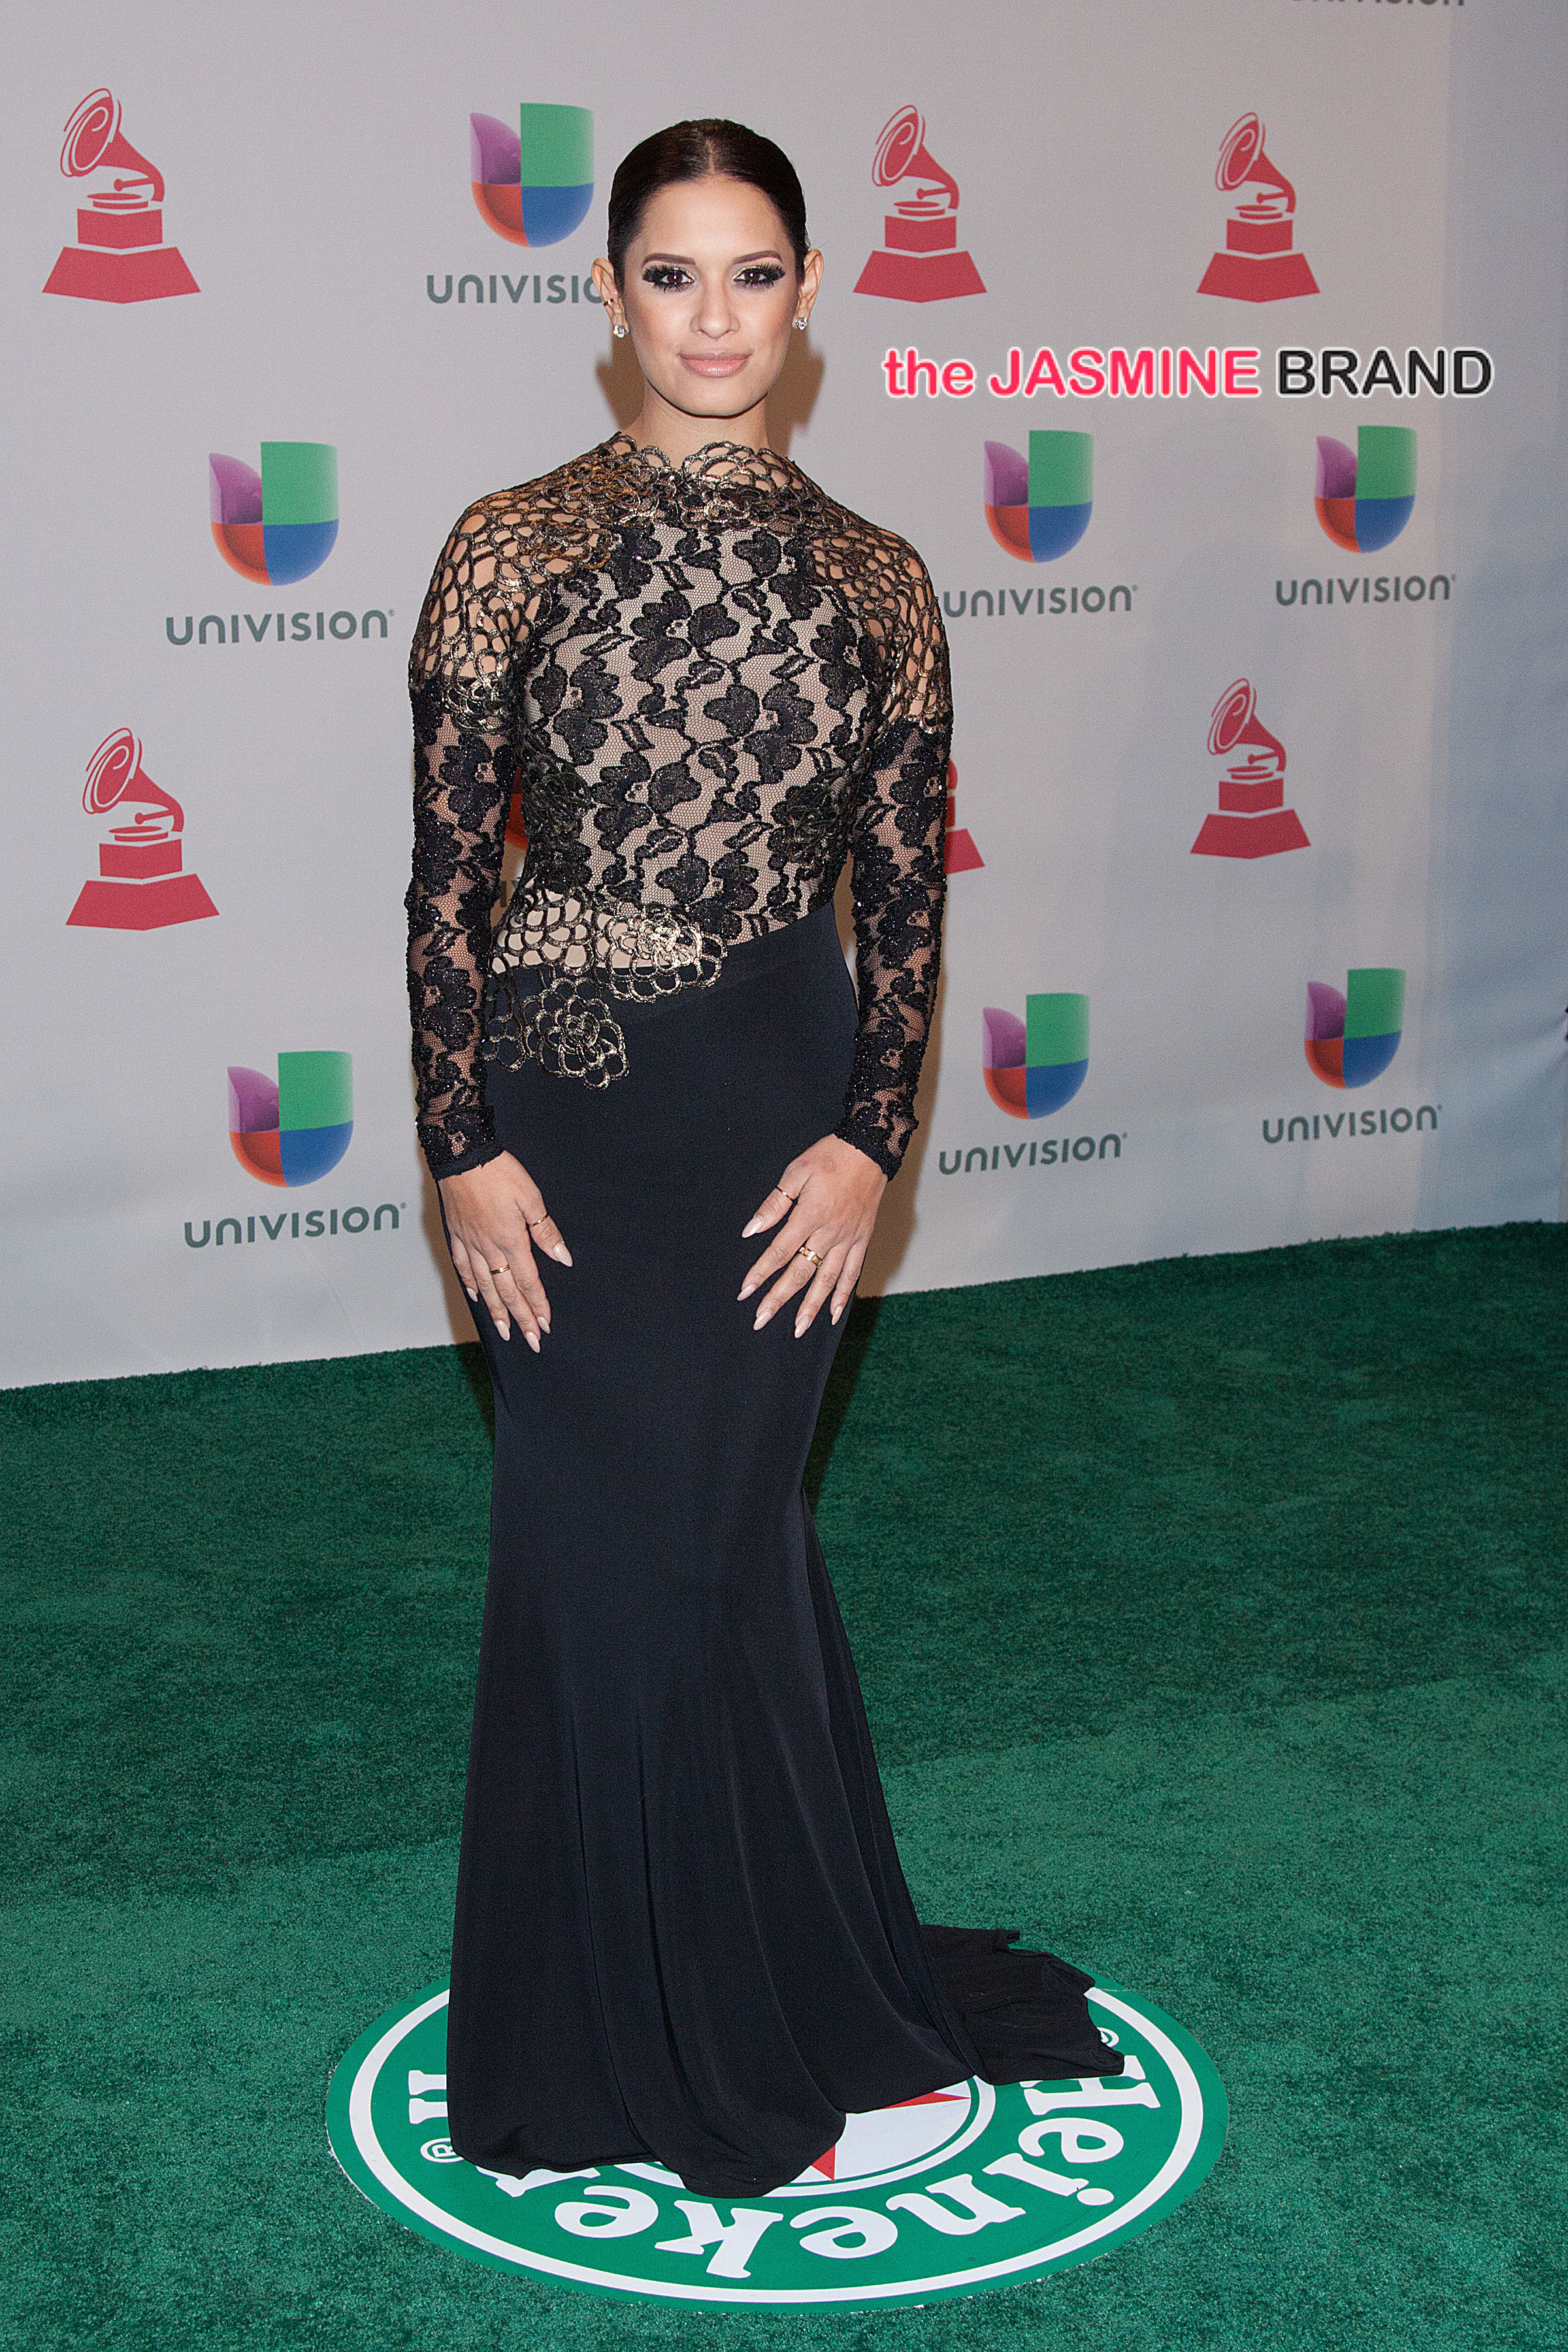 Rocsi Diaz Dania Ramirez at the 2014 Latin Grammy awards in Las Vegas